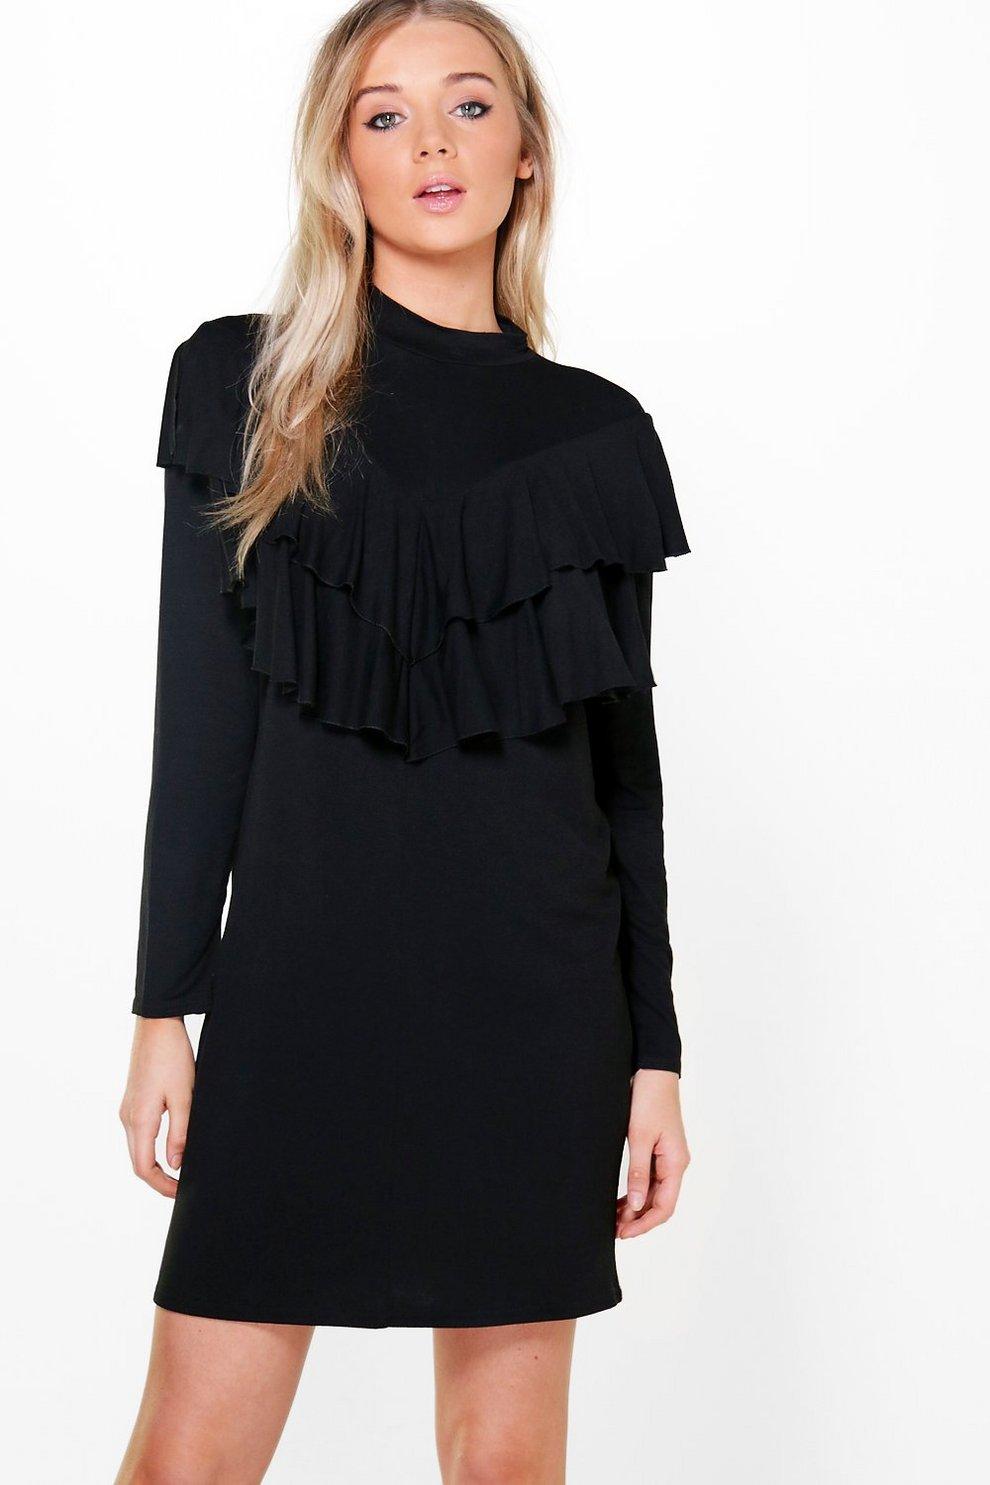 39657e17564a Womens Black Tamara Double Ruffle Layer Shift Dress